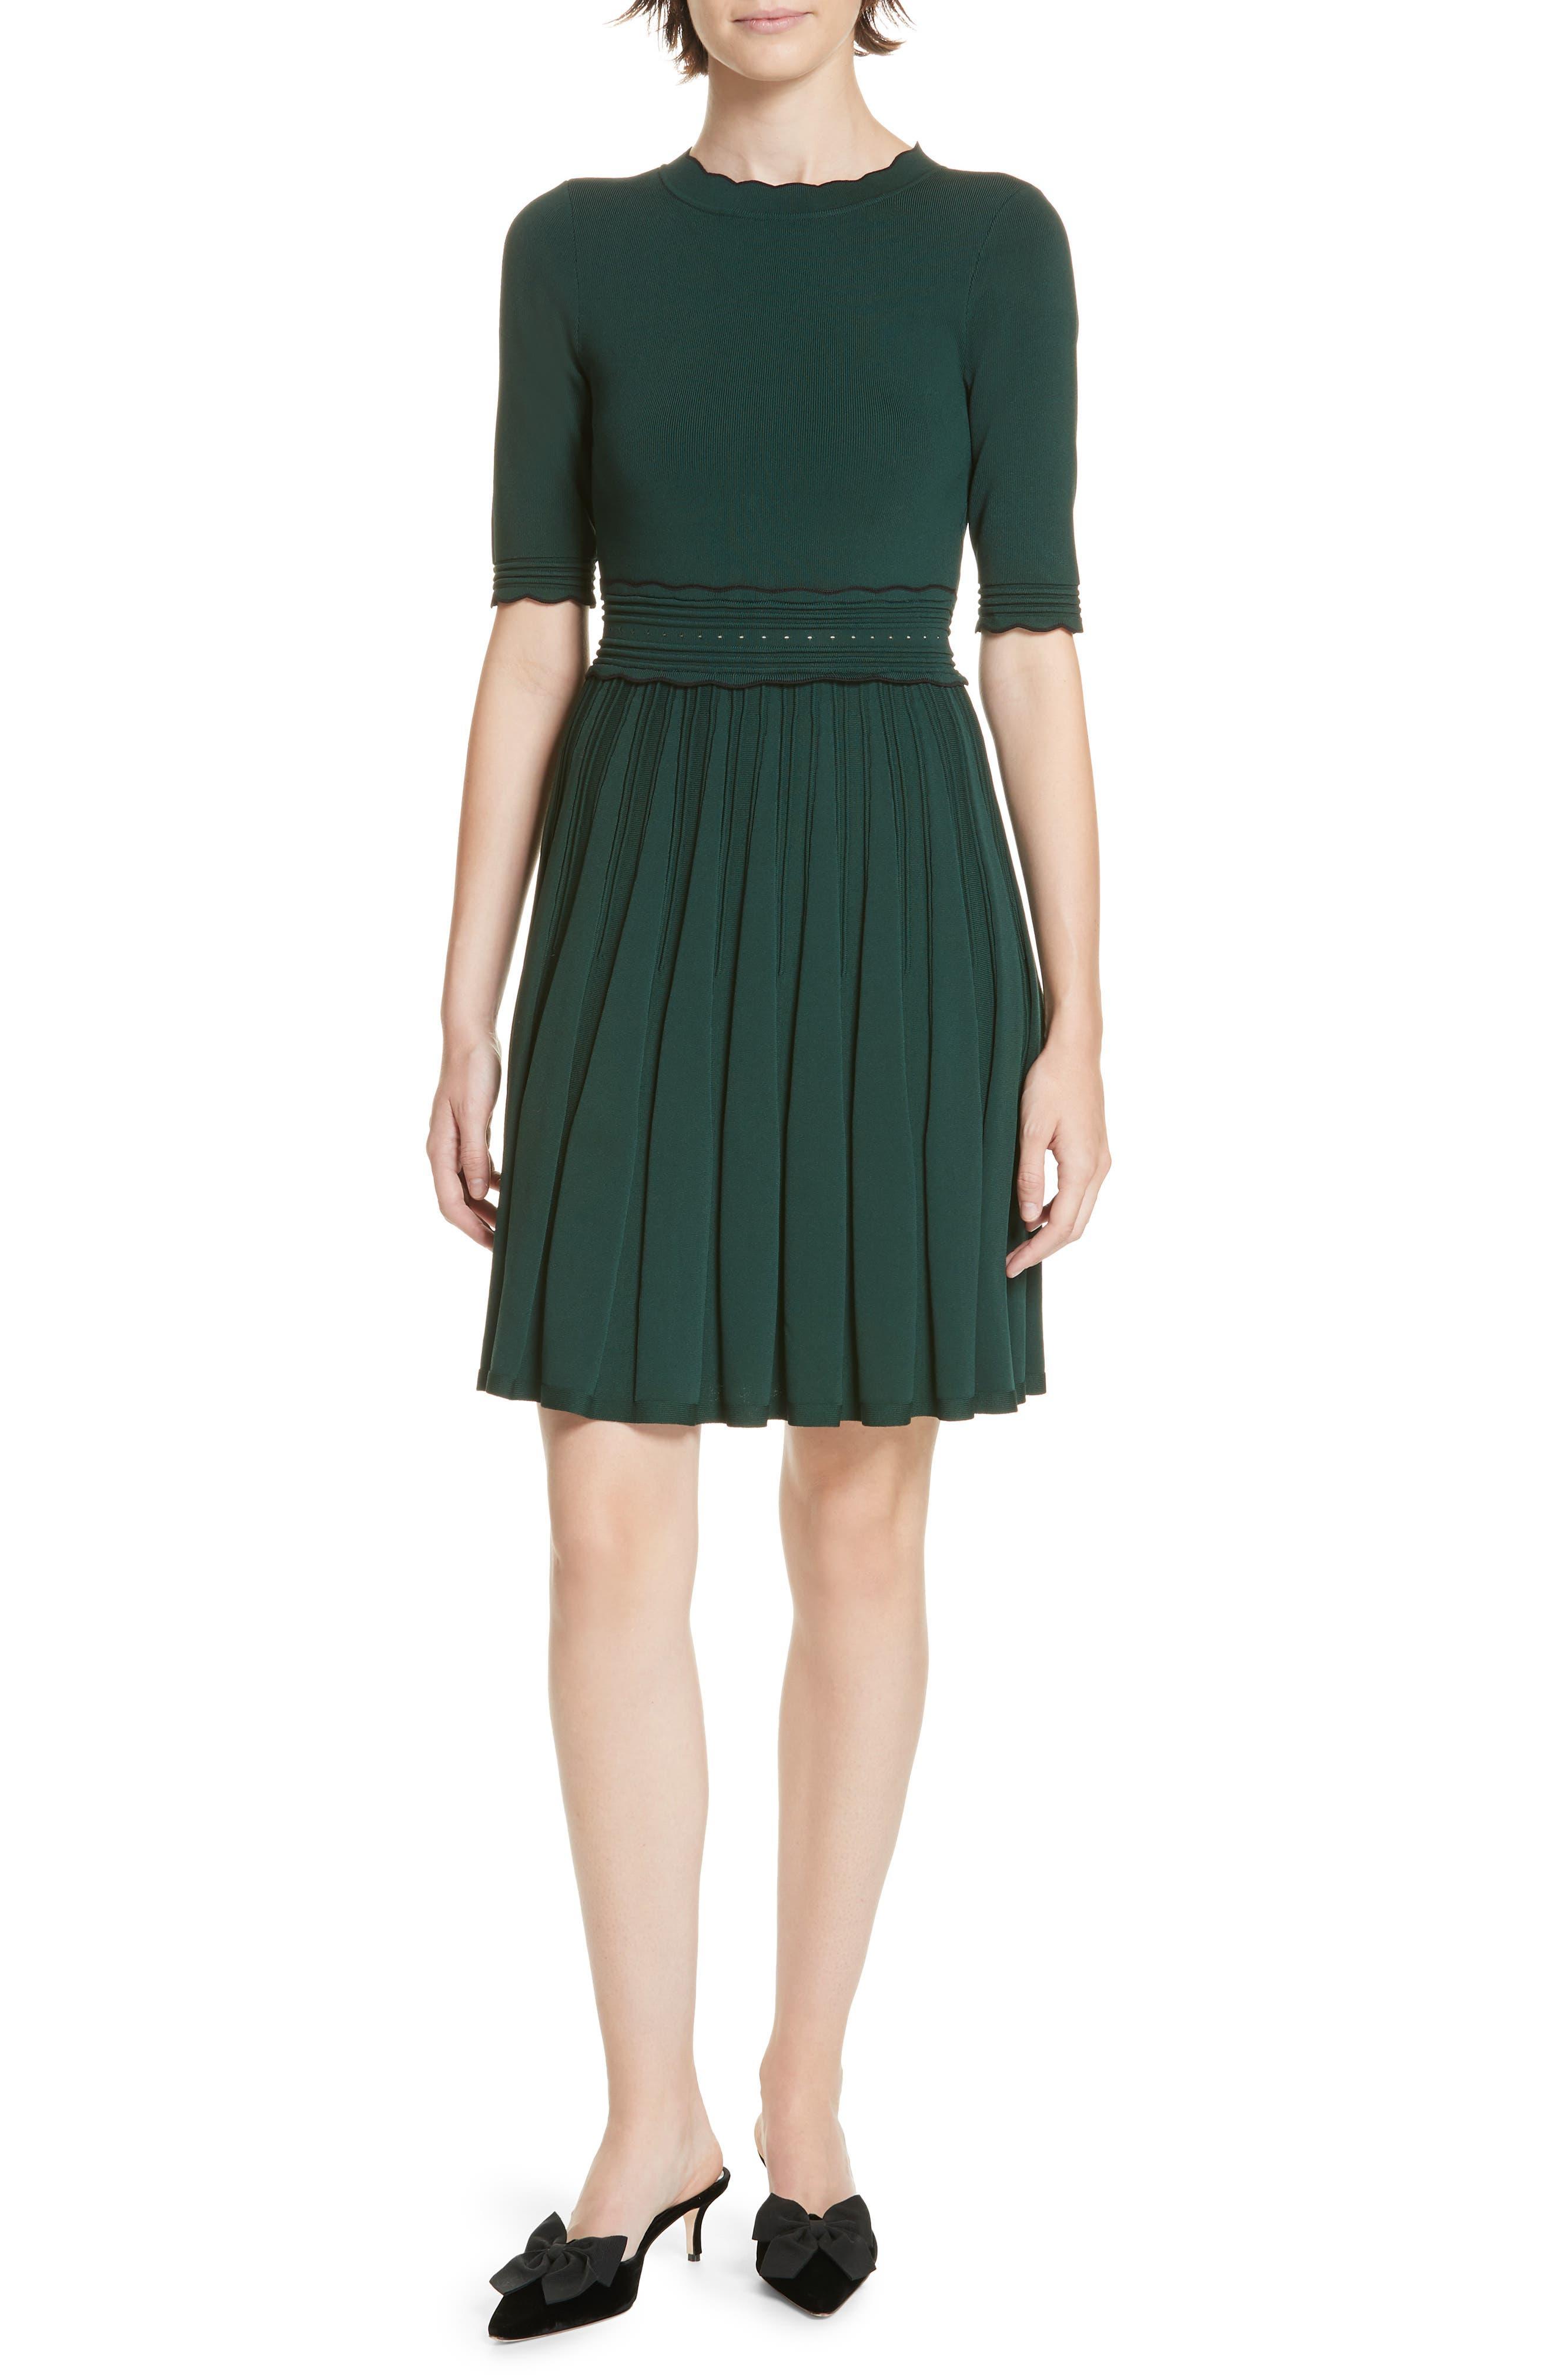 Dorlean Knit Dress,                         Main,                         color, DARK GREEN